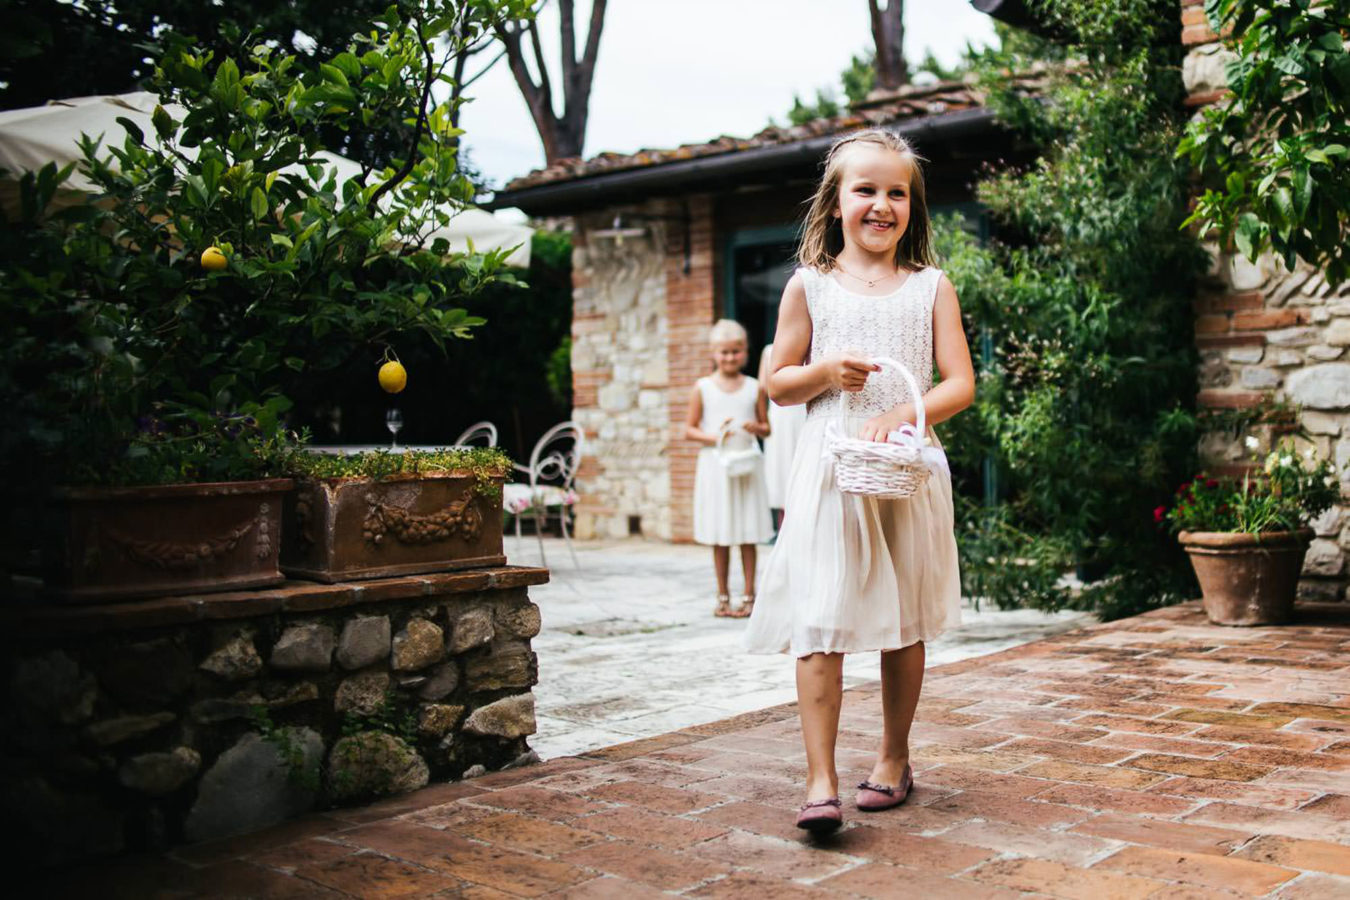 fotografo-matrimonio-firenze-toscana-16